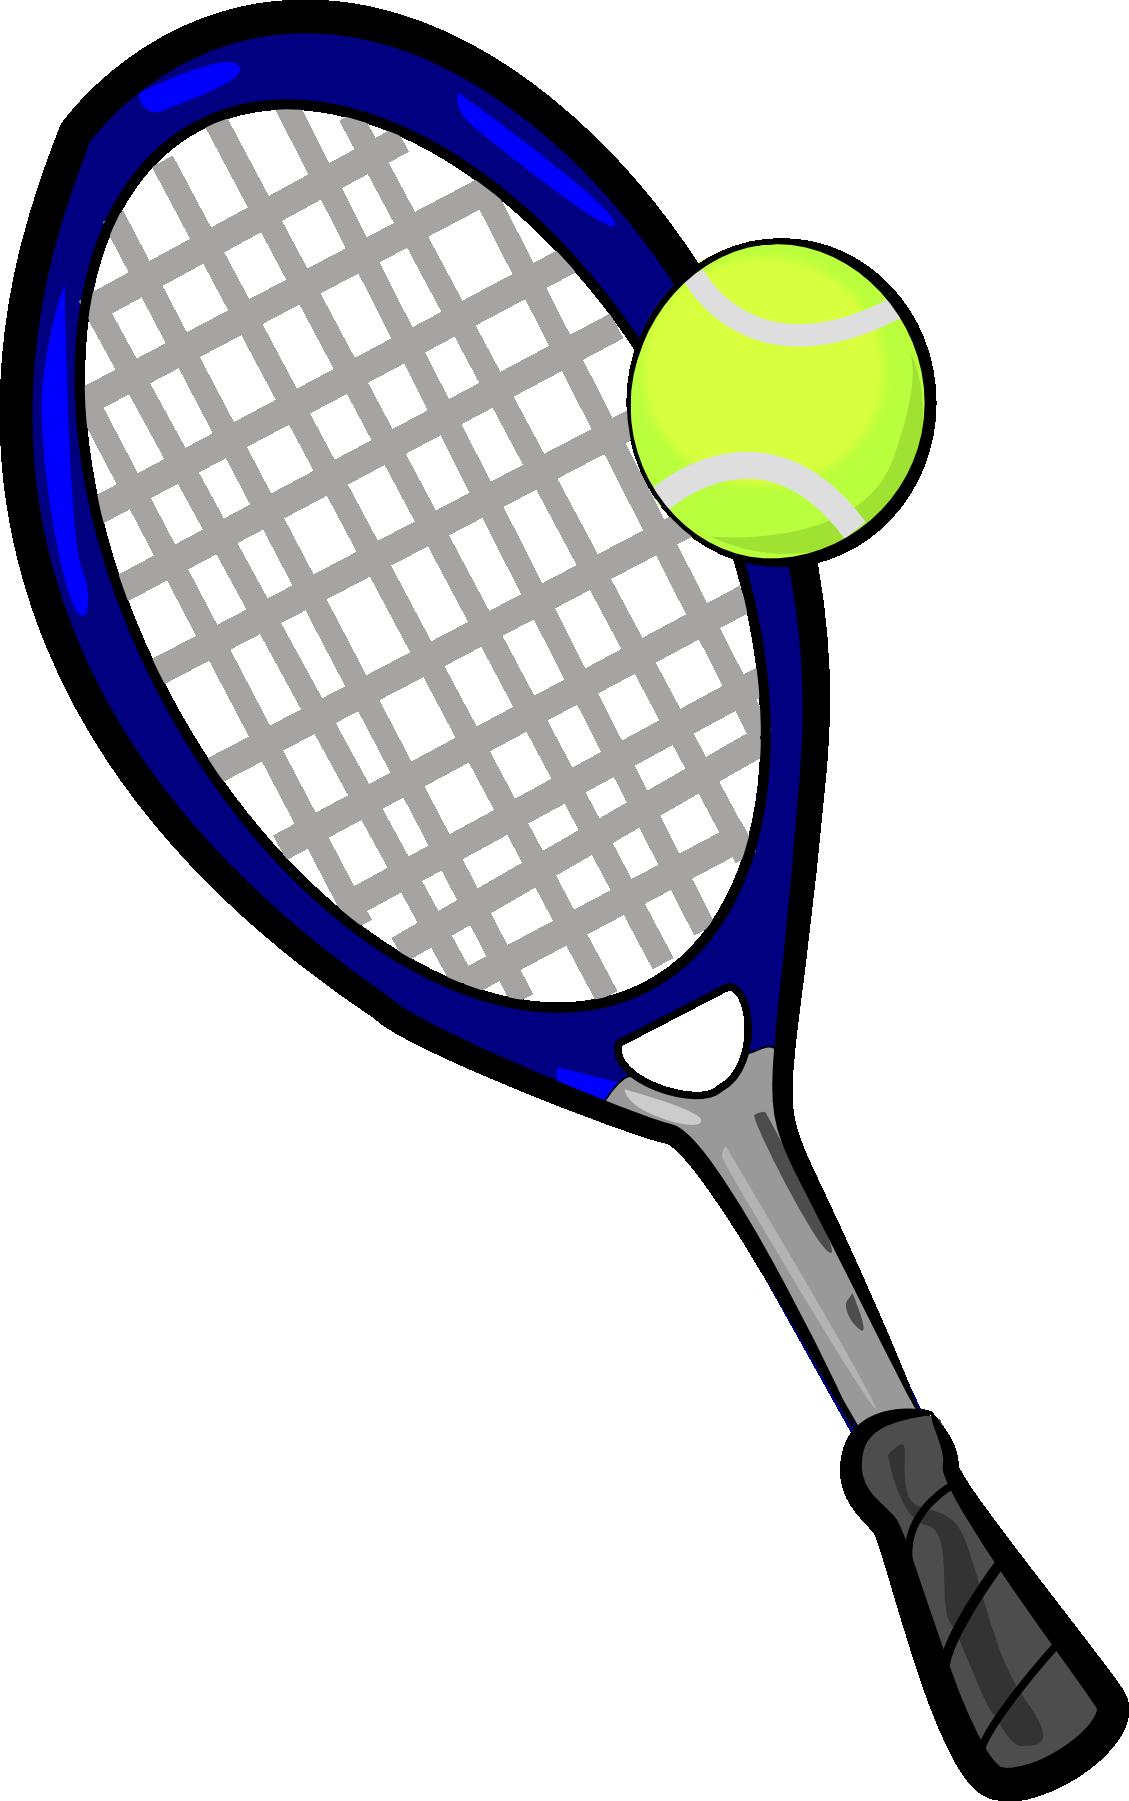 clipart panda tennis - photo #16